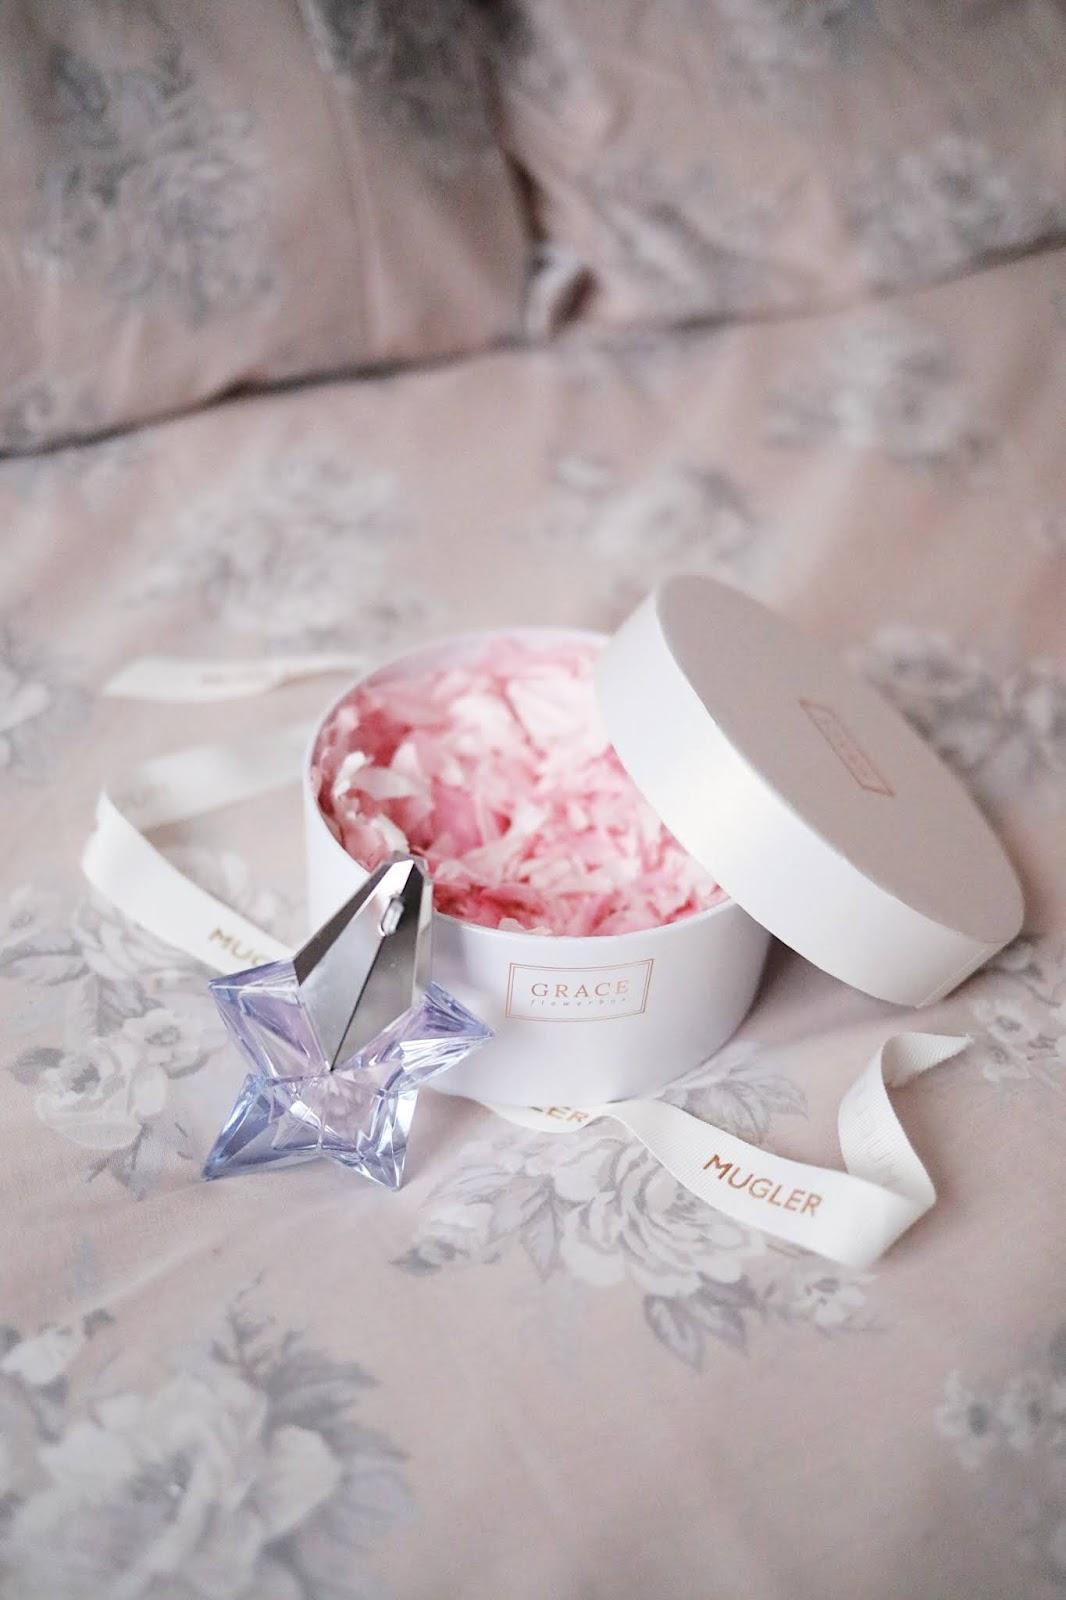 MUGLER , ANGEL , EAU DE TOILETTE , CLARINS ,rose mademoiselle , rosemademoiselle,blog beauté, paris